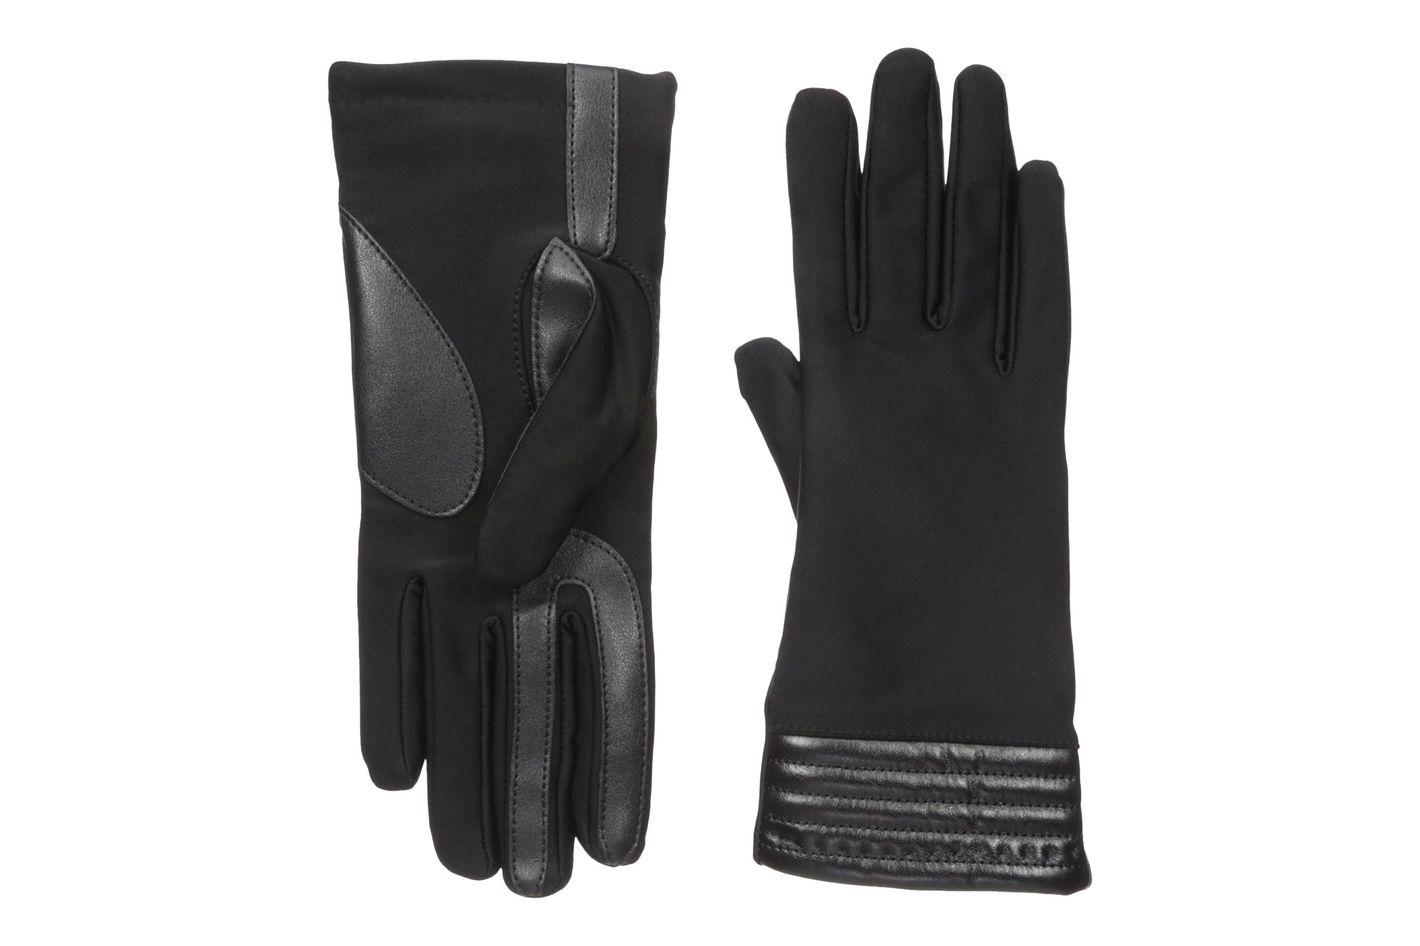 Isotoner Smartouch Spandex Glove